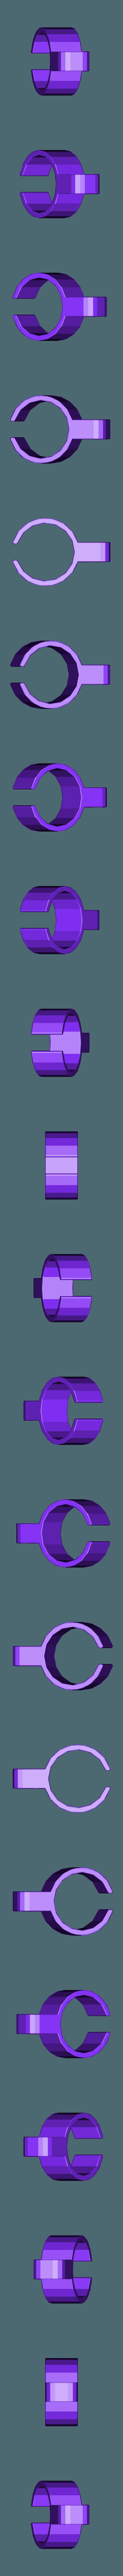 Bague-cig.stl Download free STL file Ring - cigarette • 3D printer model, mikit36